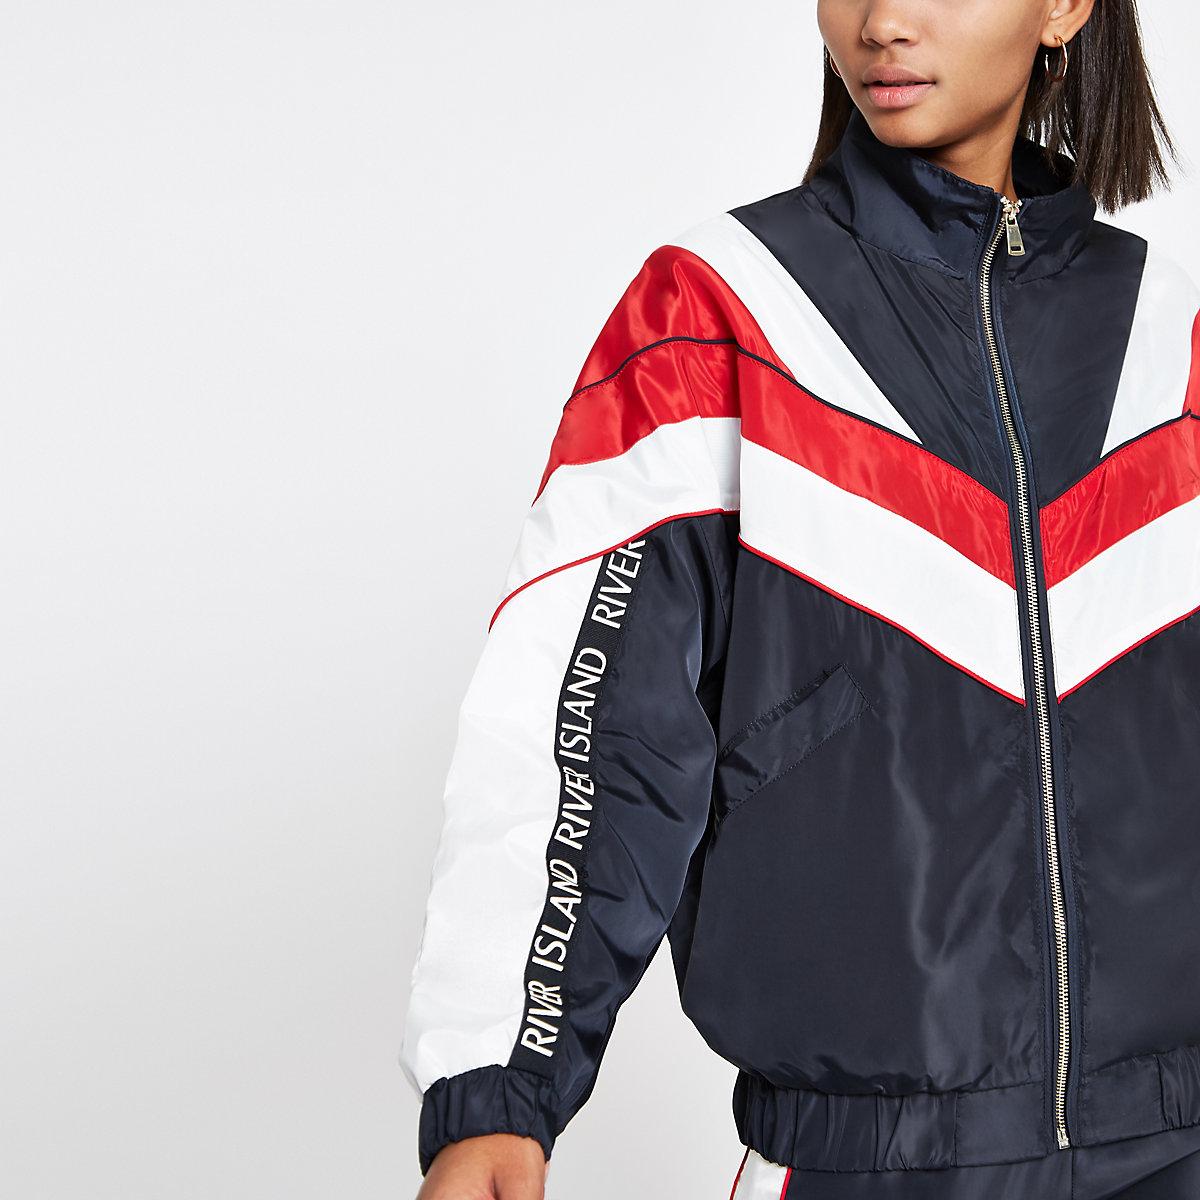 2498386e6b46 Navy block high neck track jacket - Jackets - Coats   Jackets - women